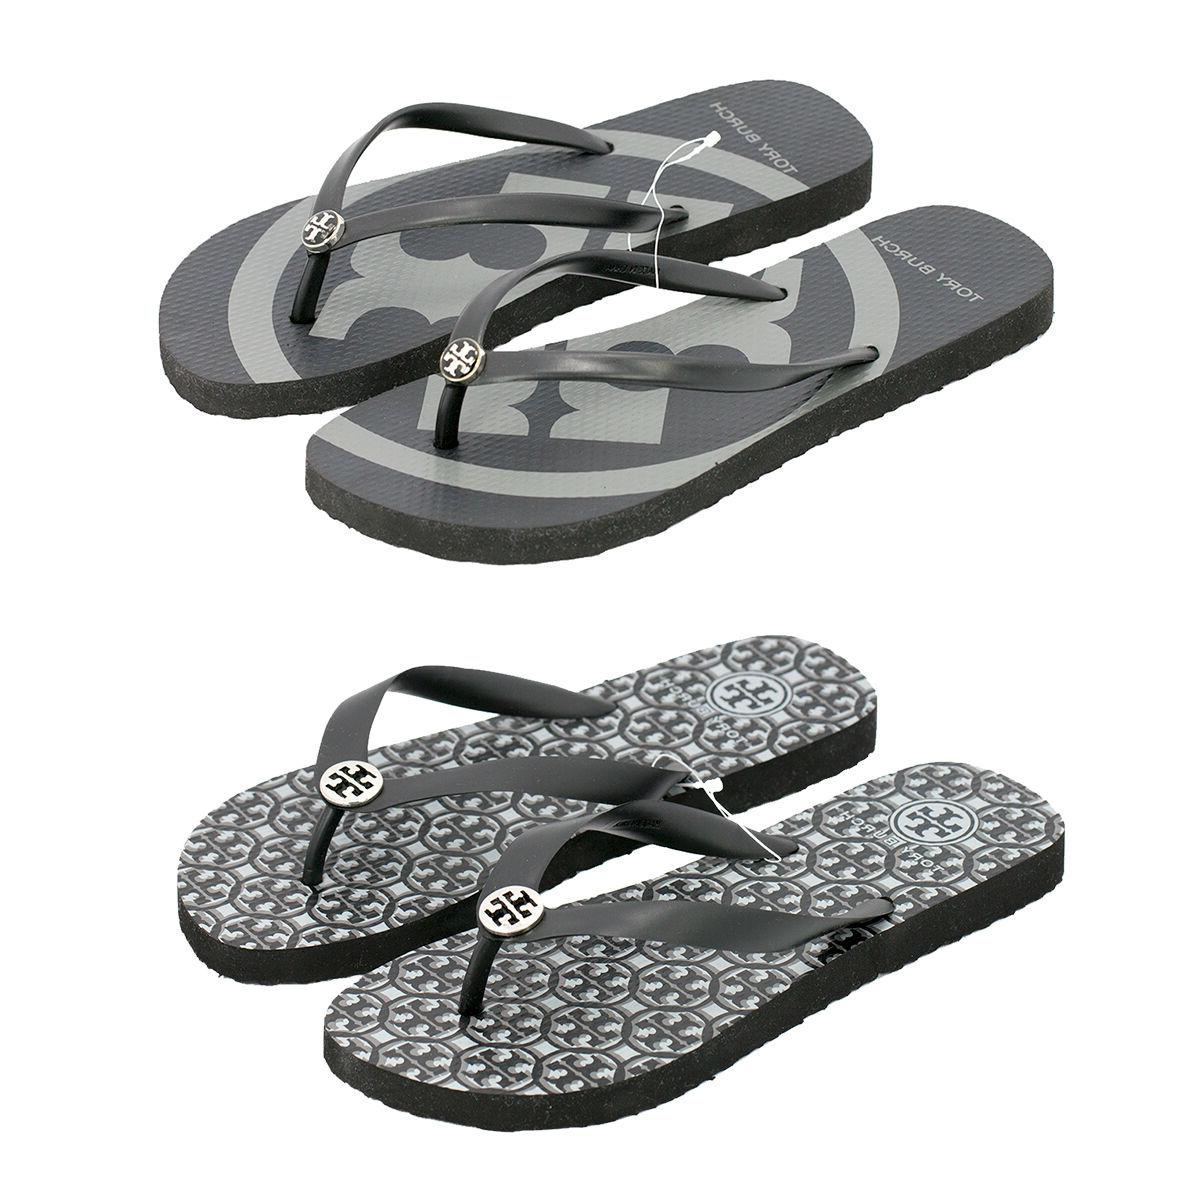 new thin flip flops sandals shoes